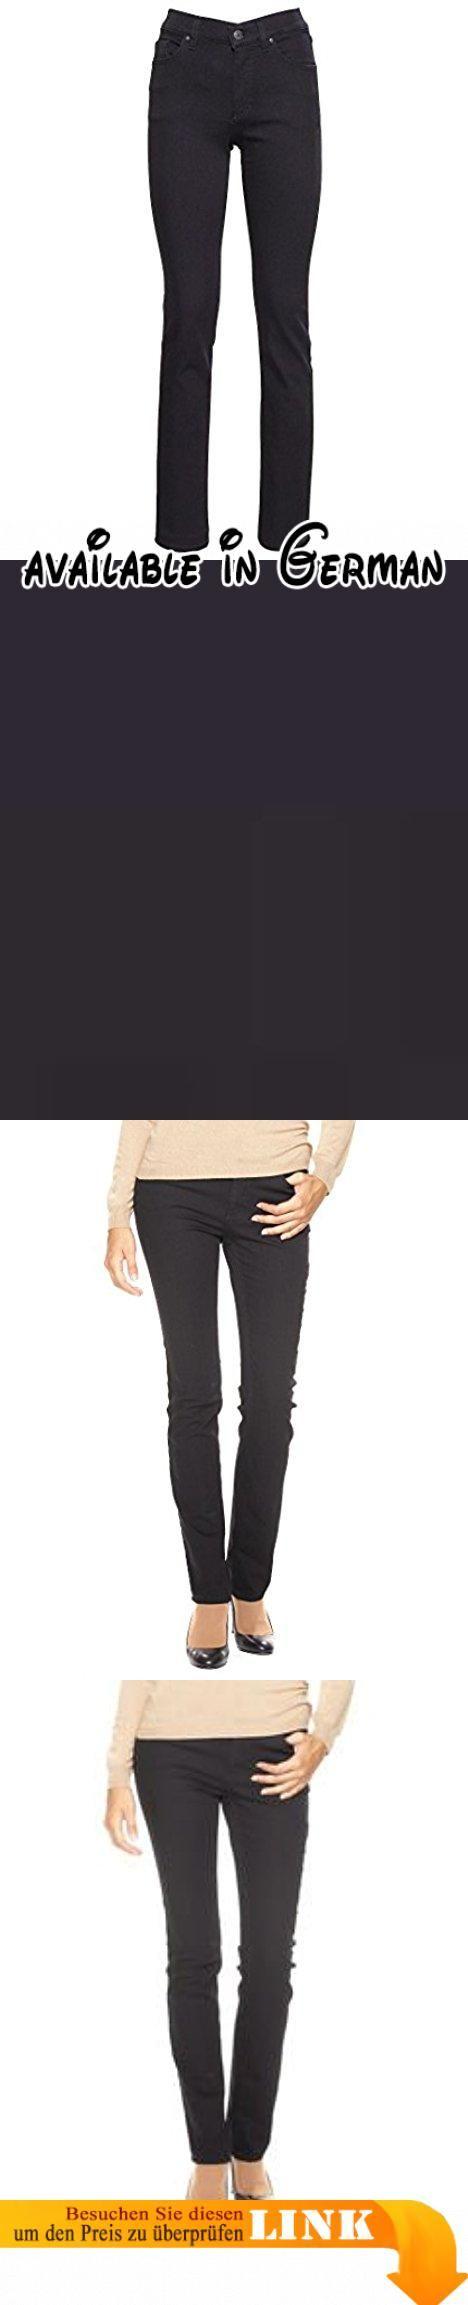 "Angels Damen Jeans ""Cici 74"" black (85) 44/30. Material: 85% Baumwolle,13% Polyester,2% Elasthan. Teile tierischen Ursprungs: Nein #Apparel #PANTS"